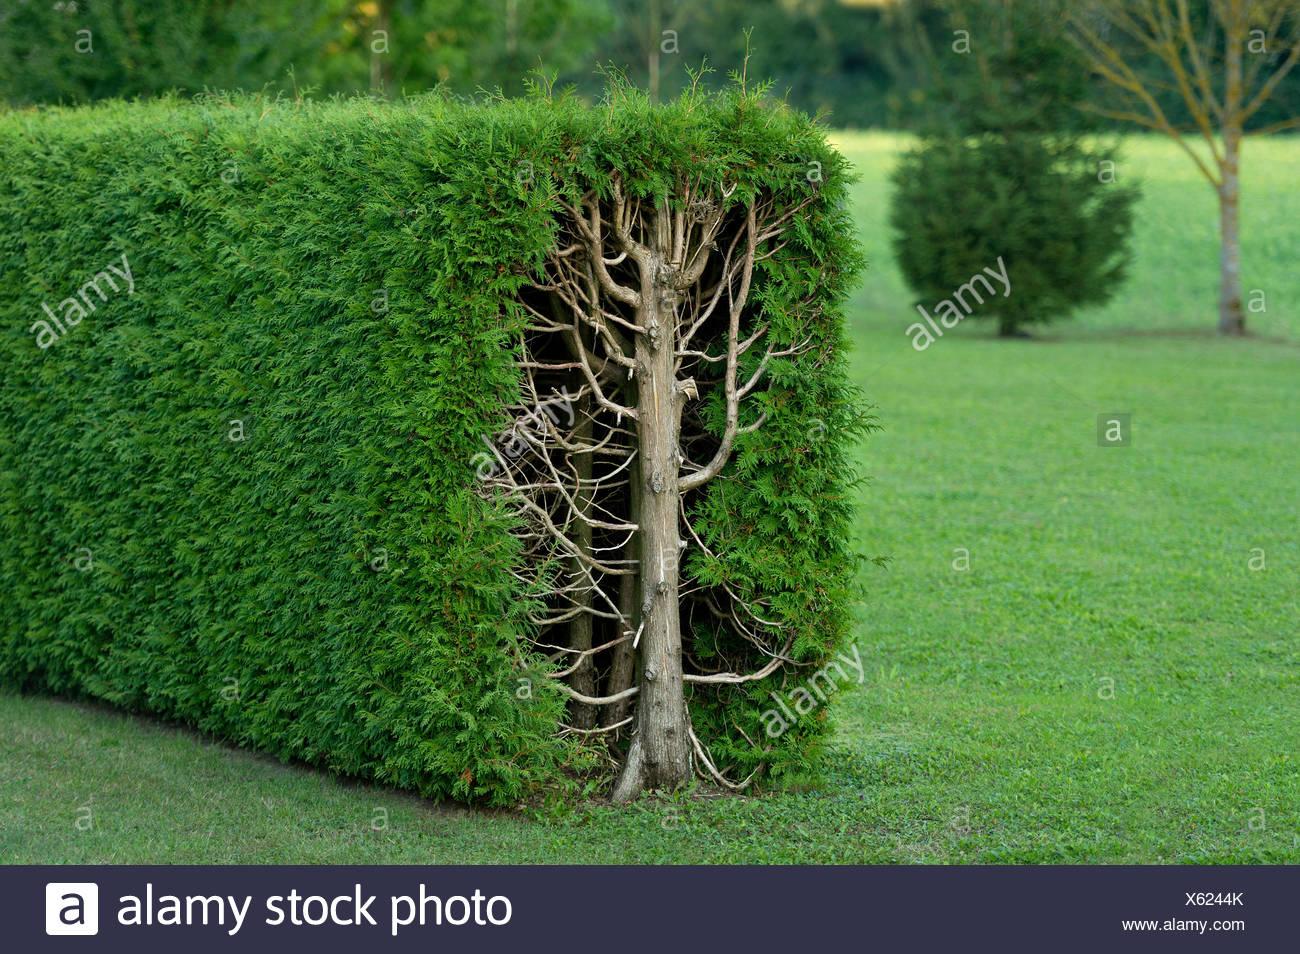 Thujas or arborvitae (Thuja) trimmed rectangular hedge, cross-section, Fischerhäuser, Ismaning, Upper Bavaria, Bavaria, Germany - Stock Image